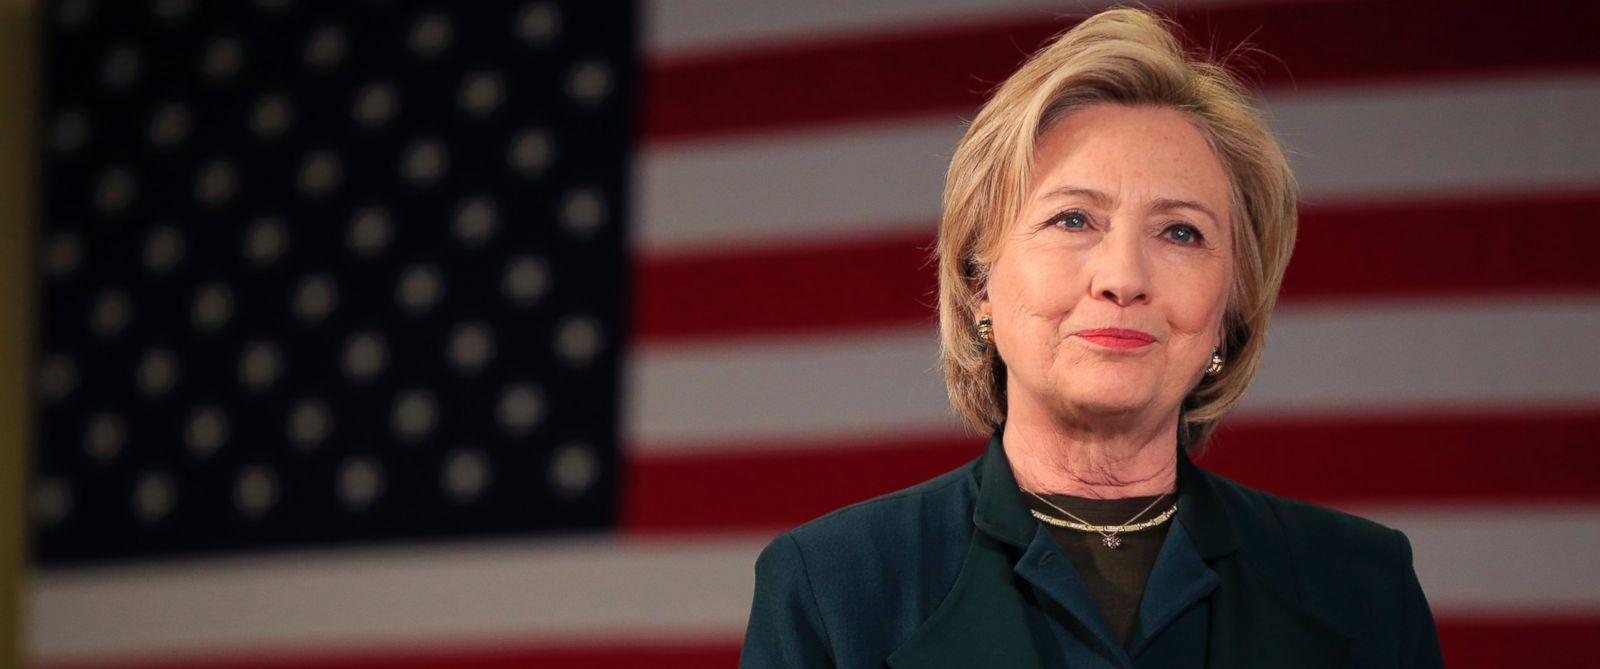 Hillary Clinton, 69 anni. Candidata democratica - Foto: ABCNews